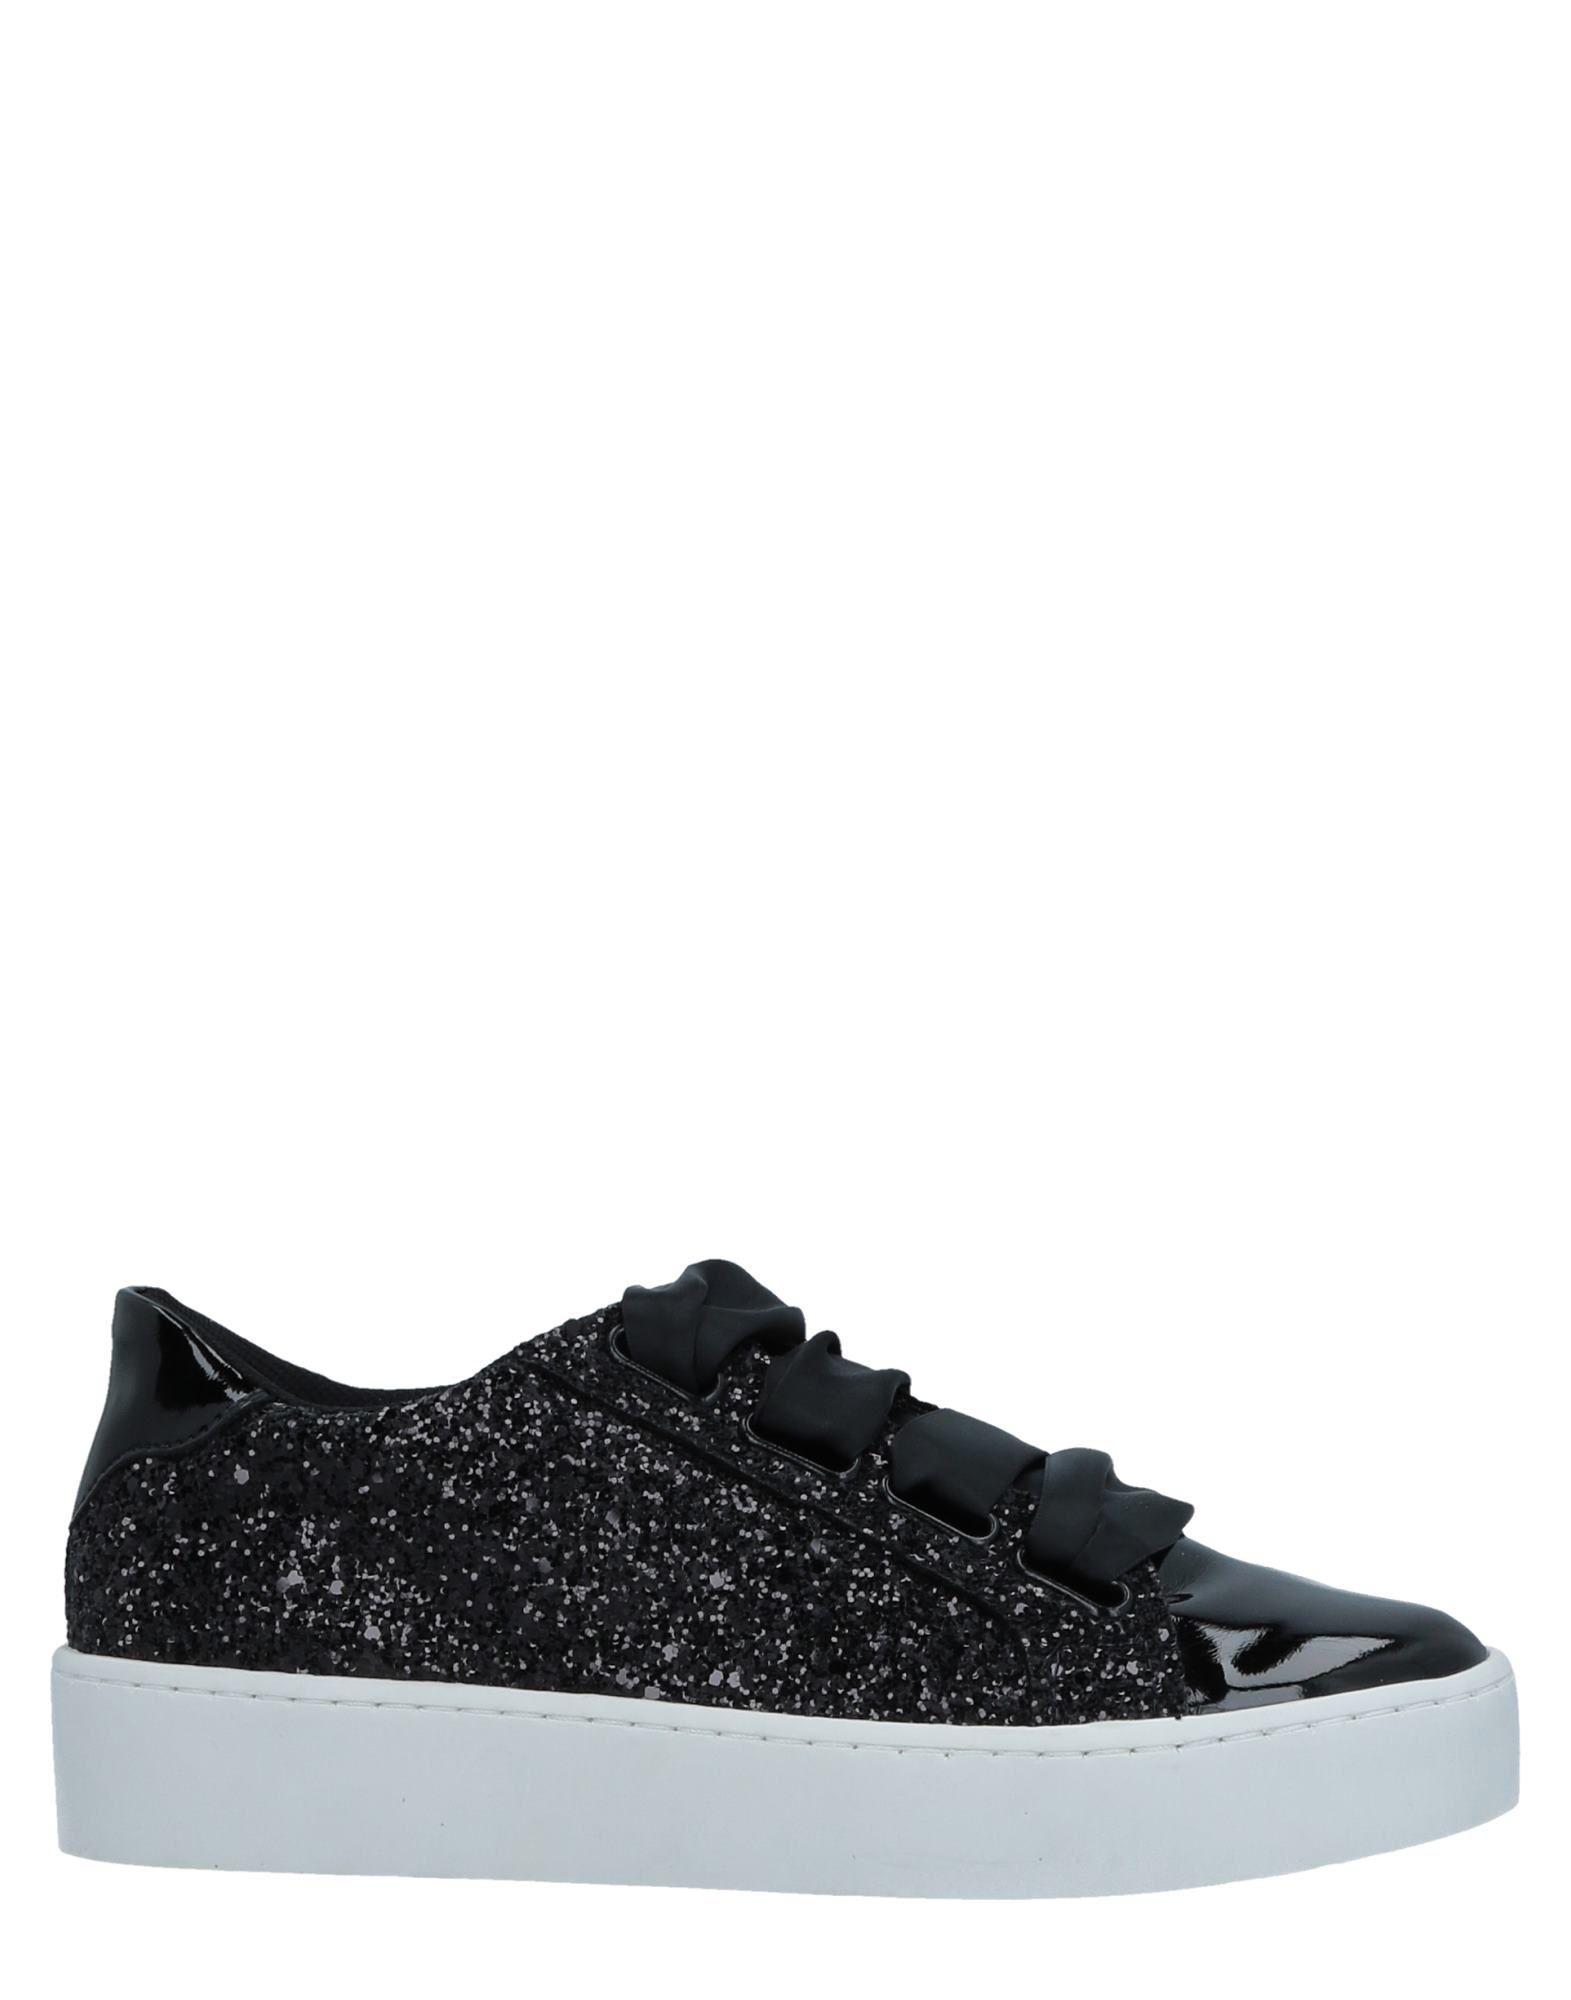 Lollipops Sneakers Damen  11521000OP Gute Qualität beliebte Schuhe